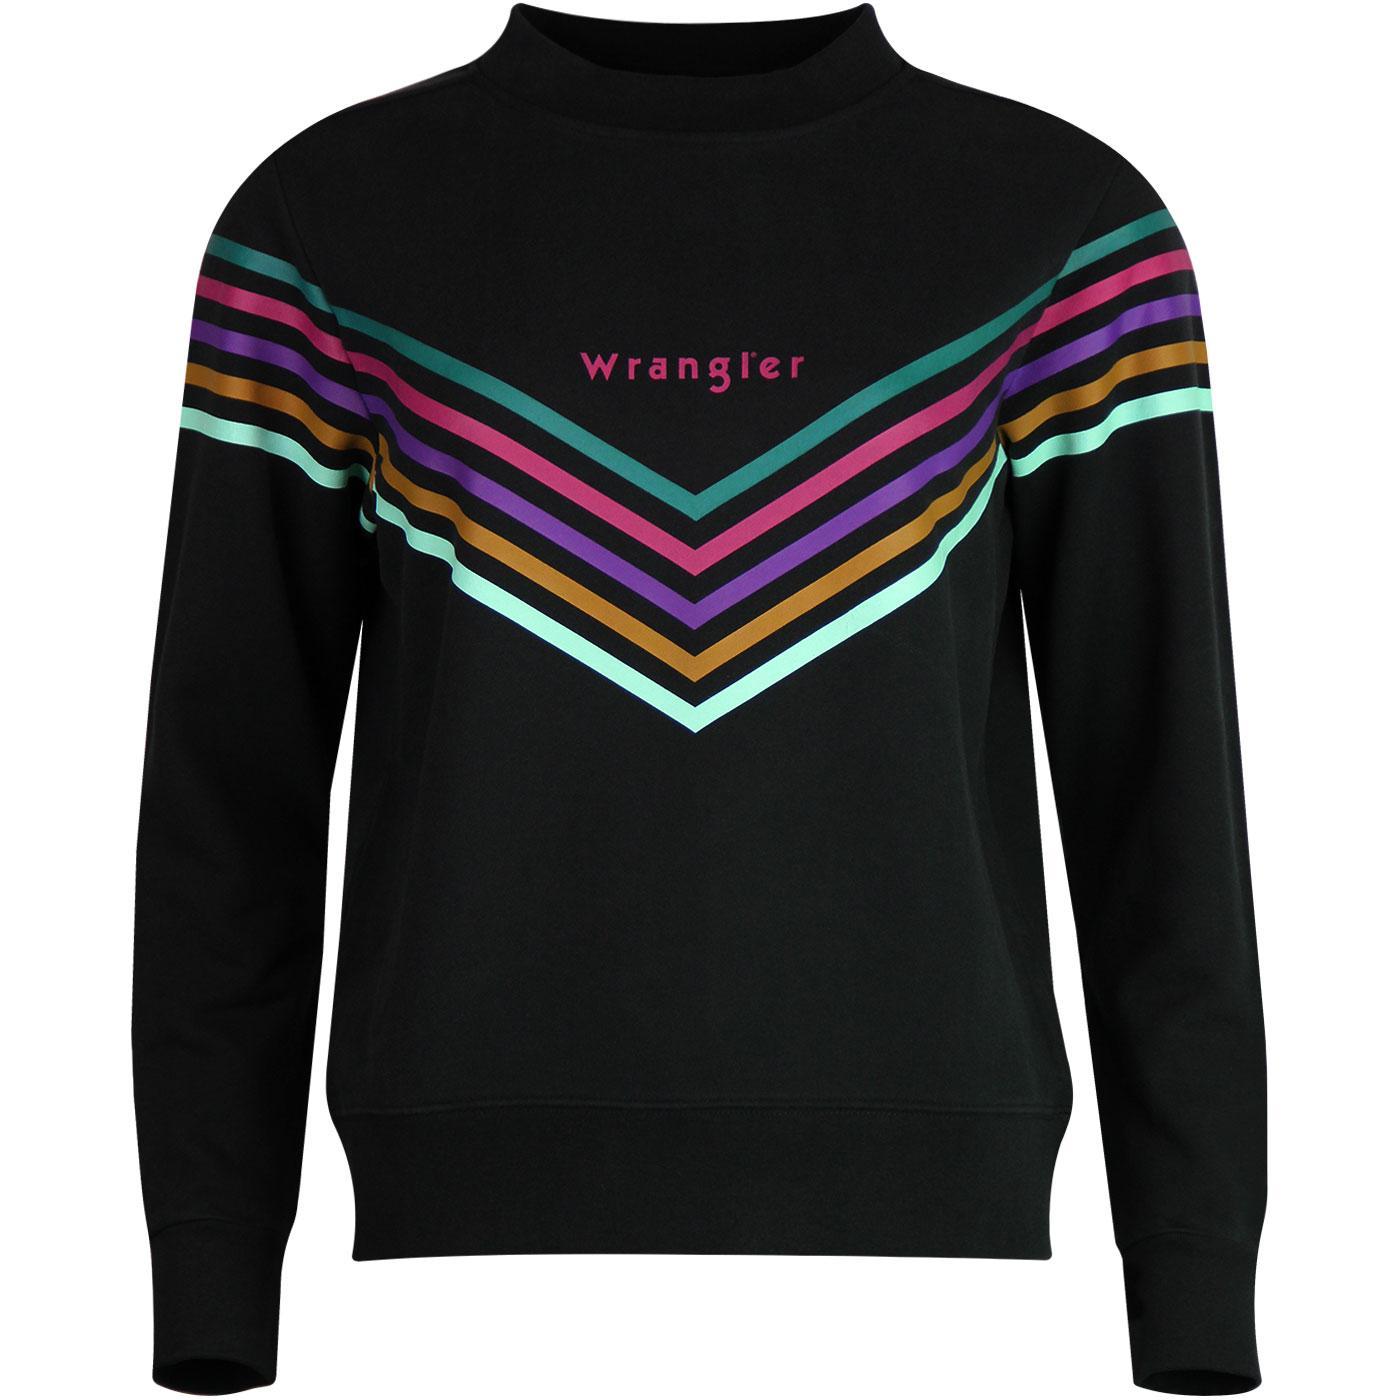 WRANGLER Women's Retro Rainbow Chevron Sweatshirt